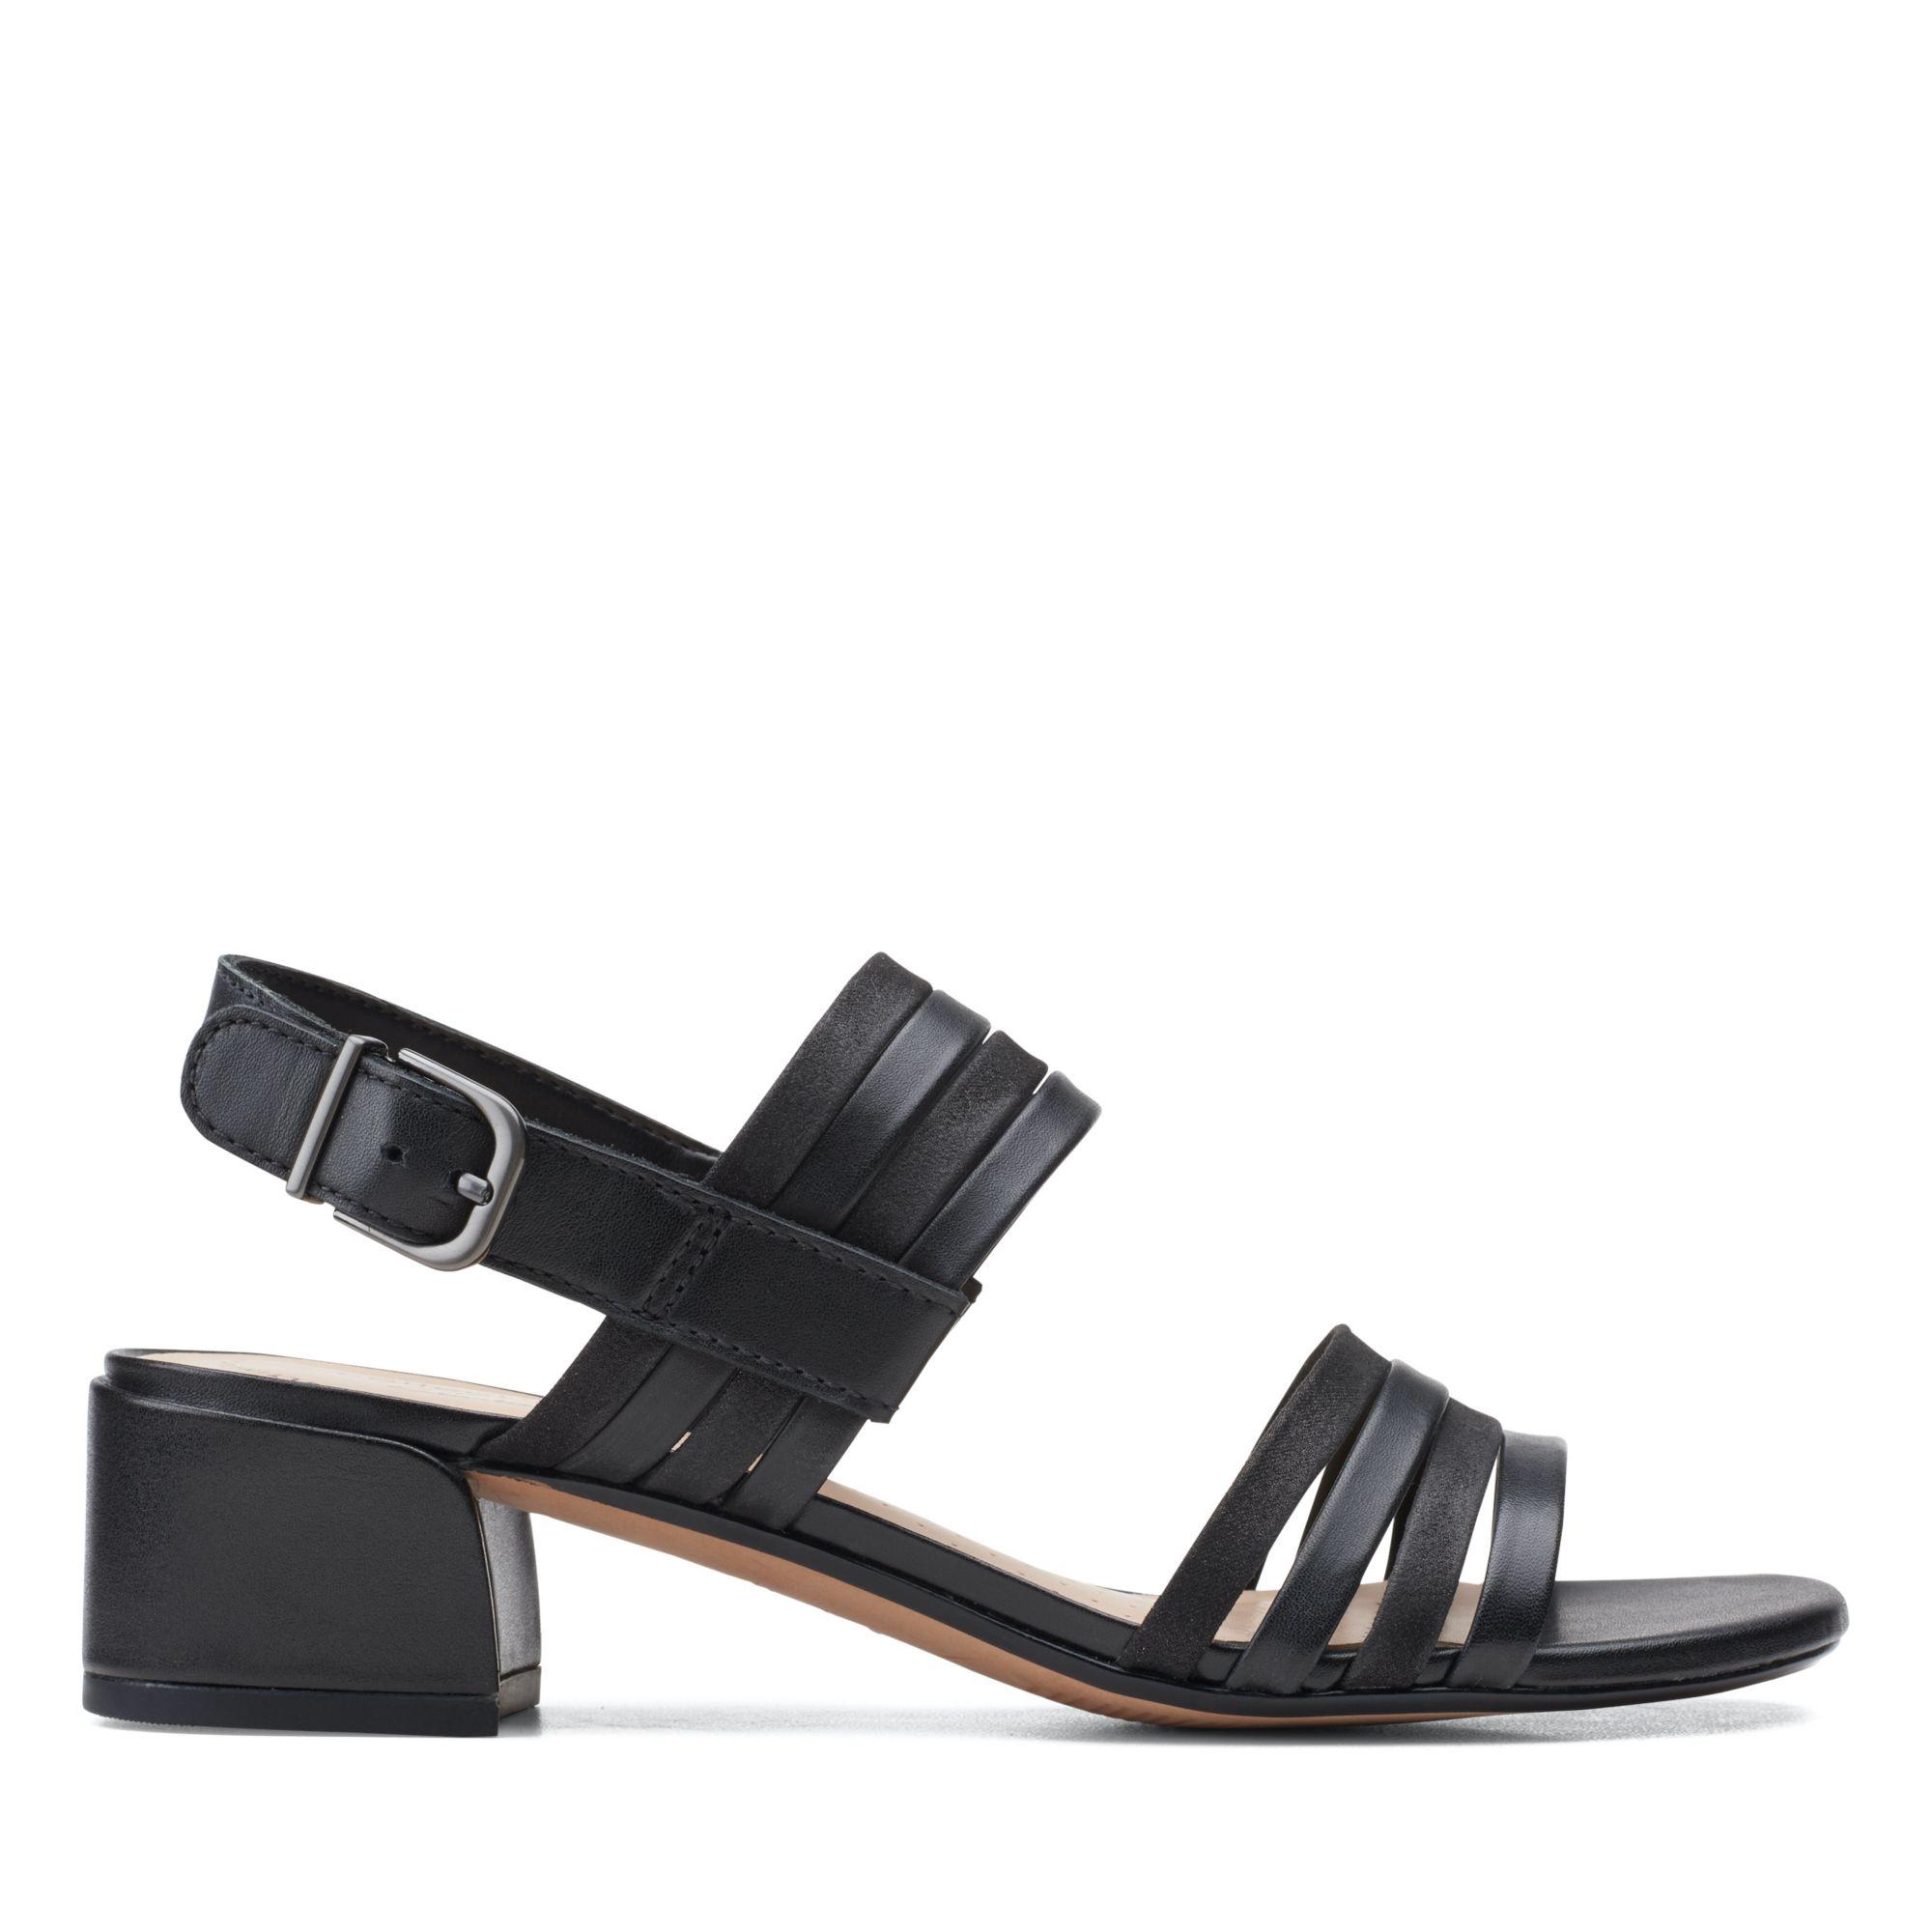 Clarks仲夏之夢-Caroleigh Bess 雙色細帶方跟涼鞋(黑色拼色)